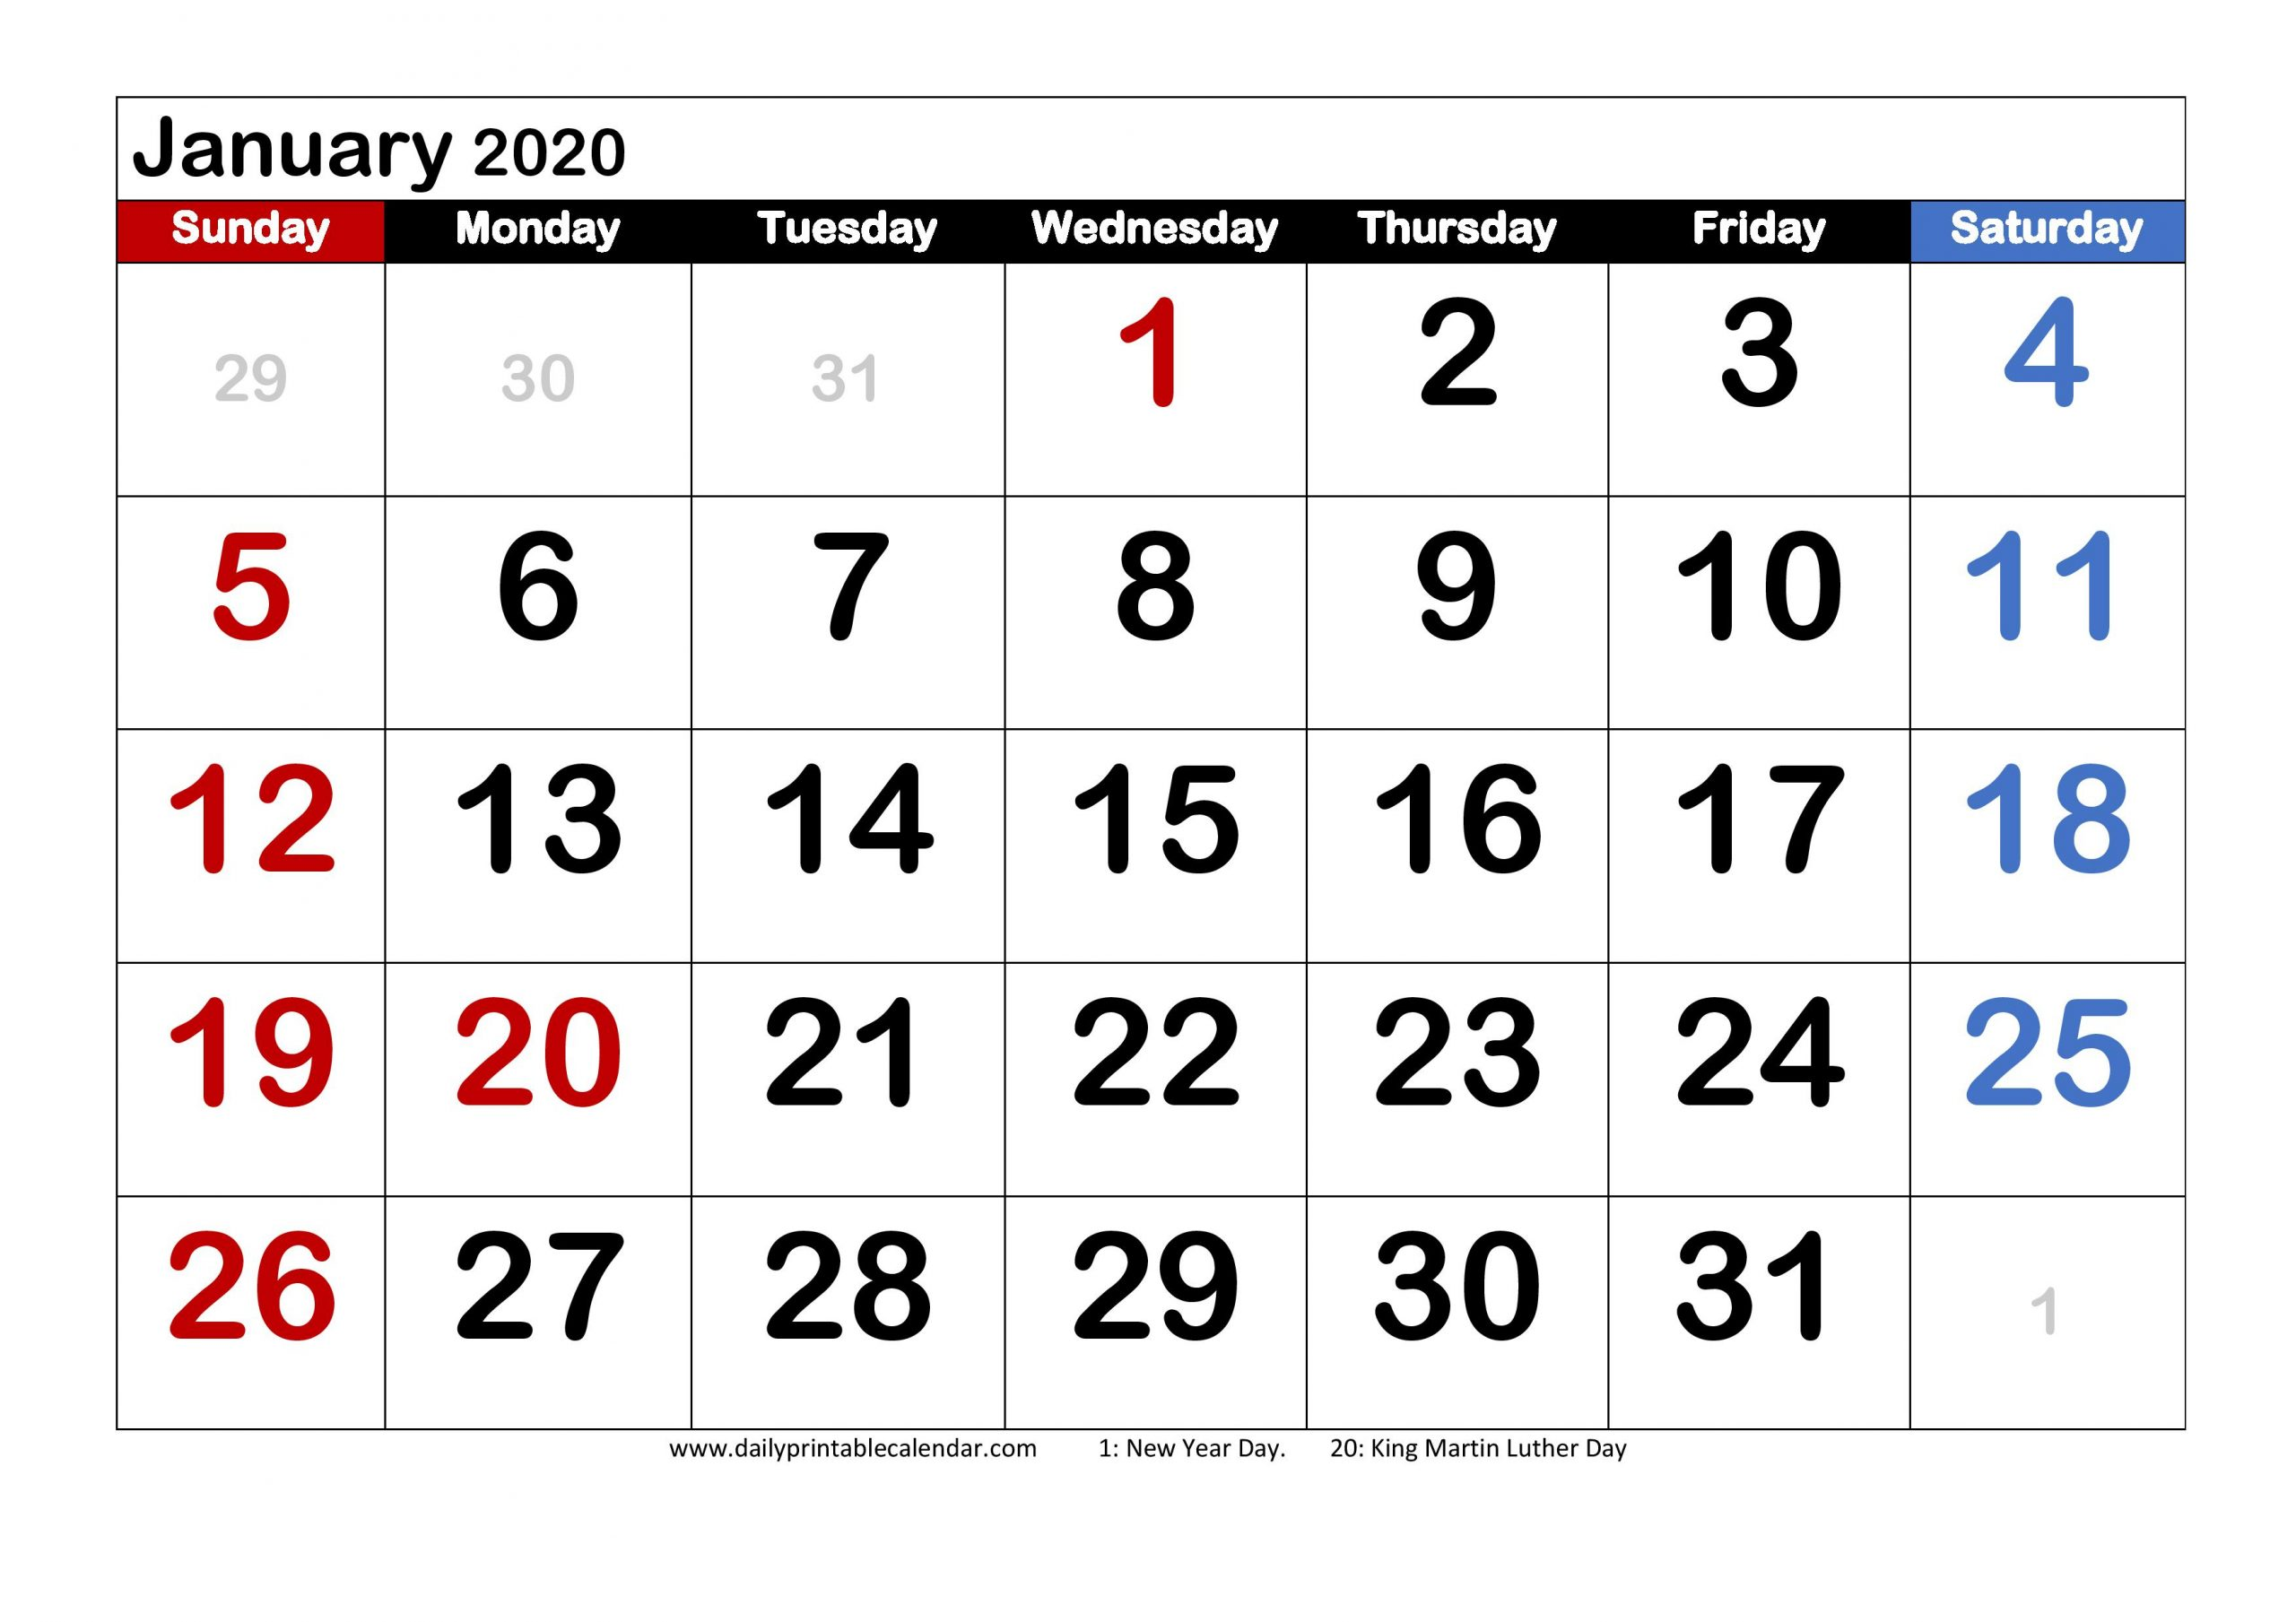 January 2020 Calendar Printable - Blank Templates - 2020